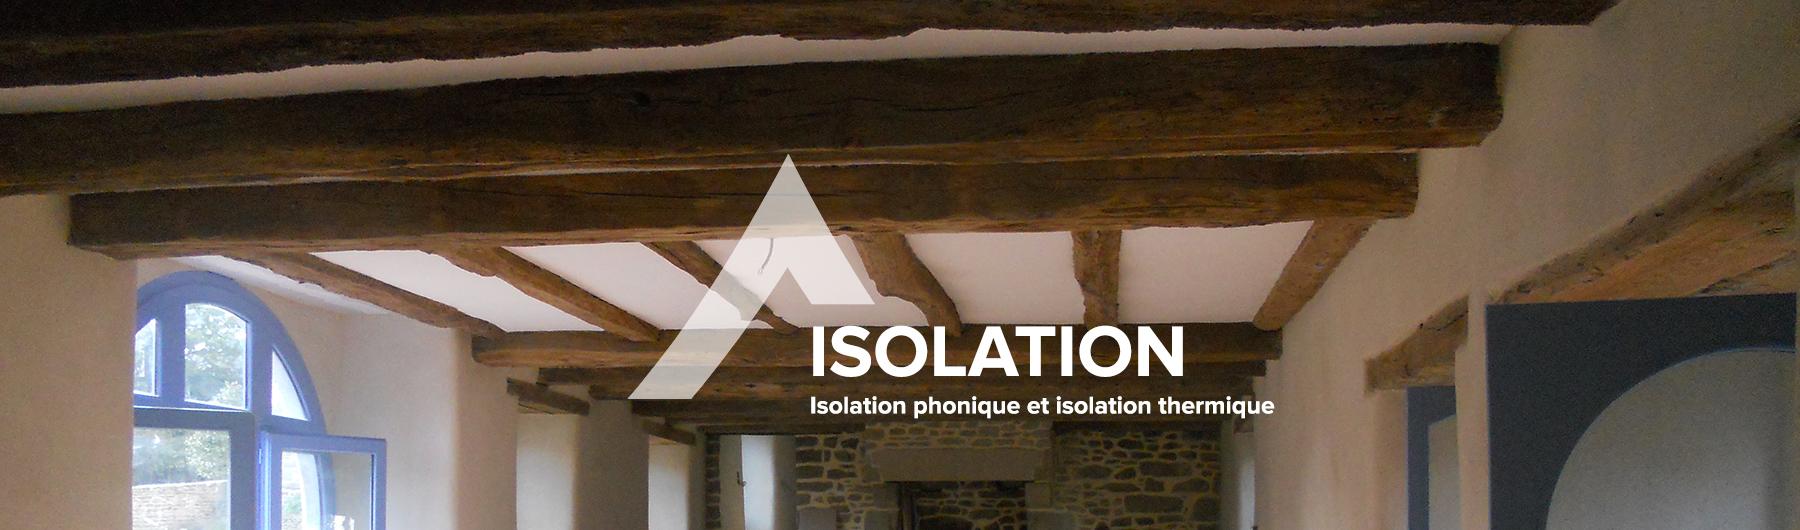 isolation-phonique-thermique